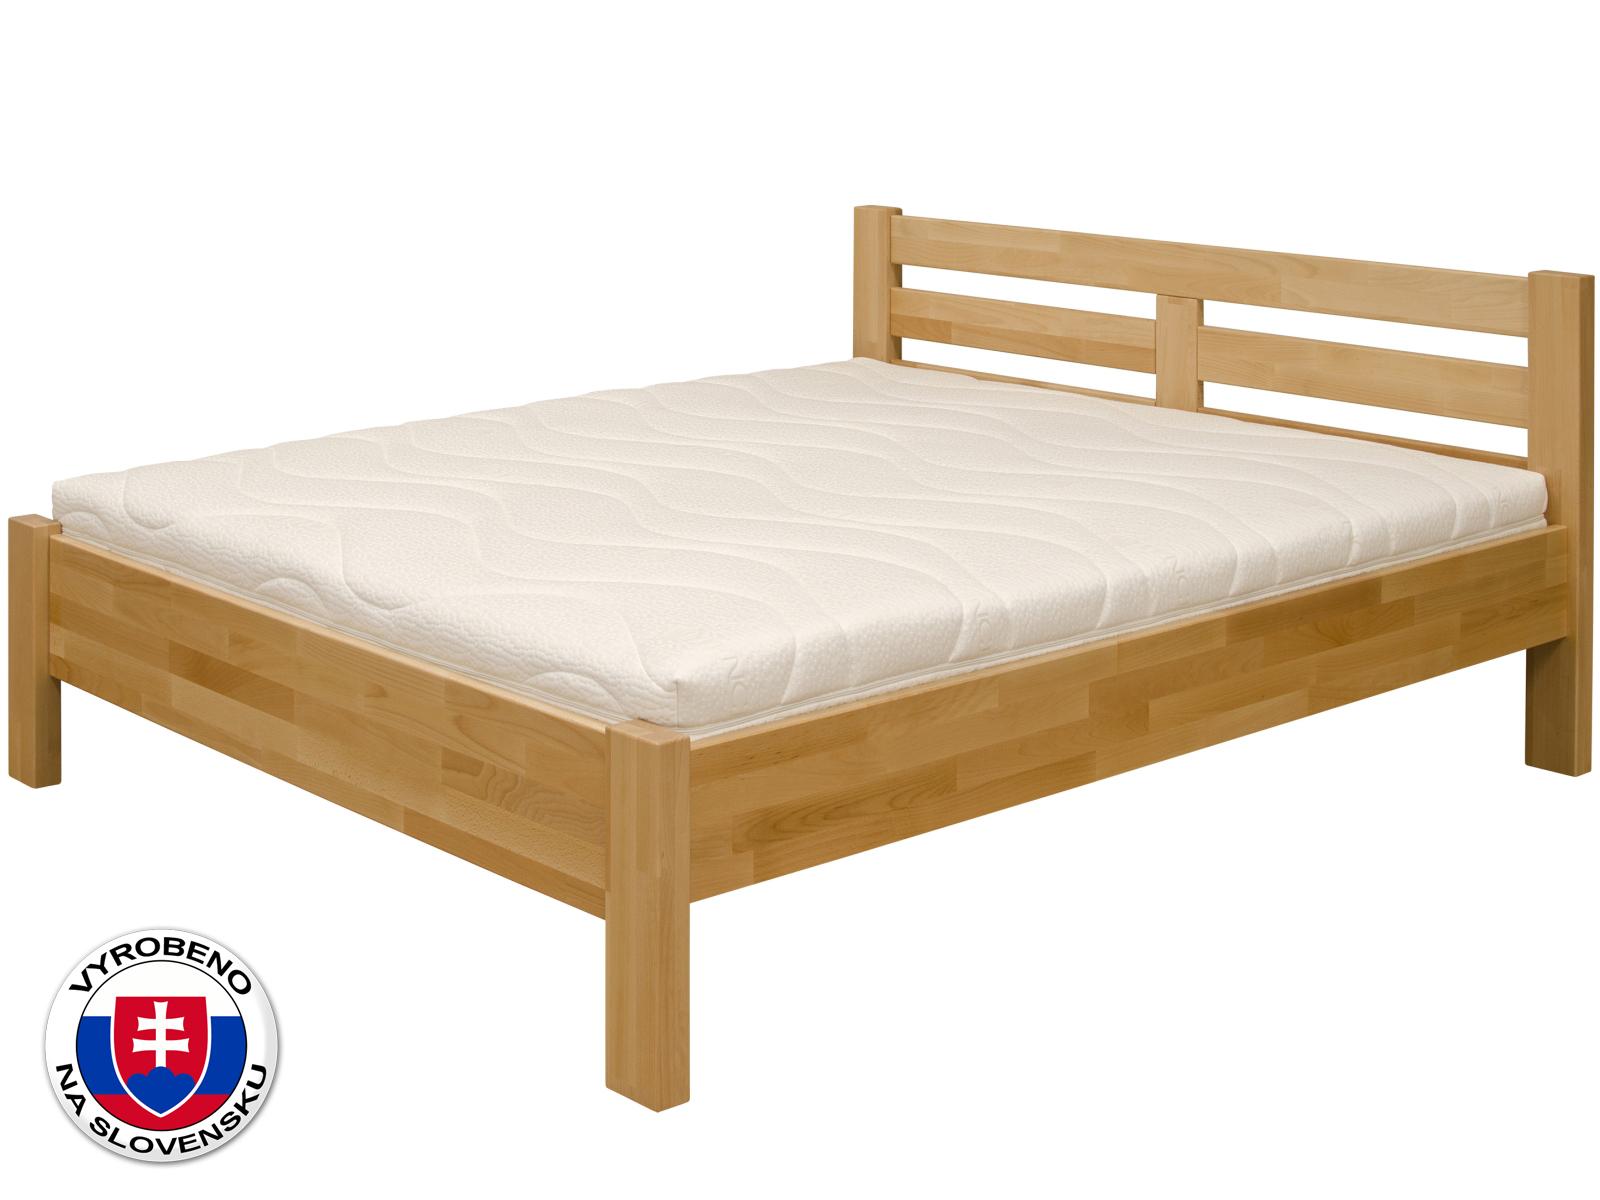 Manželská postel 180 cm - Purtex - Mia (masiv)